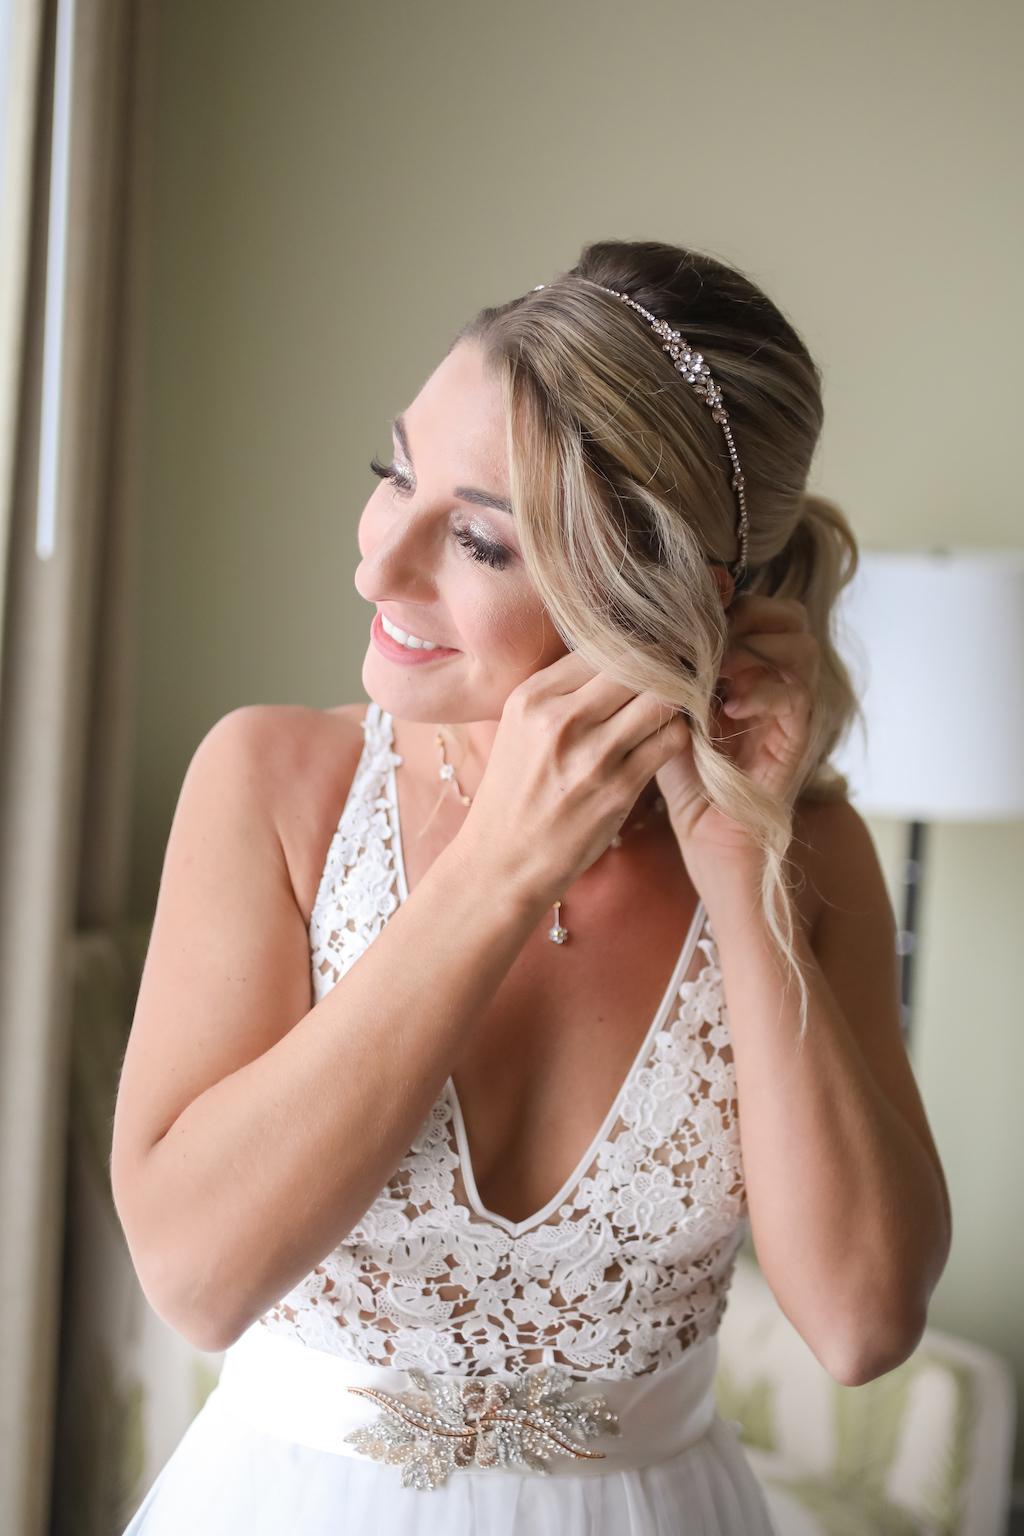 Florida Bride Getting Ready Wedding Portrait   Tampa Bay Wedding Photographer Lifelong Photography Studios